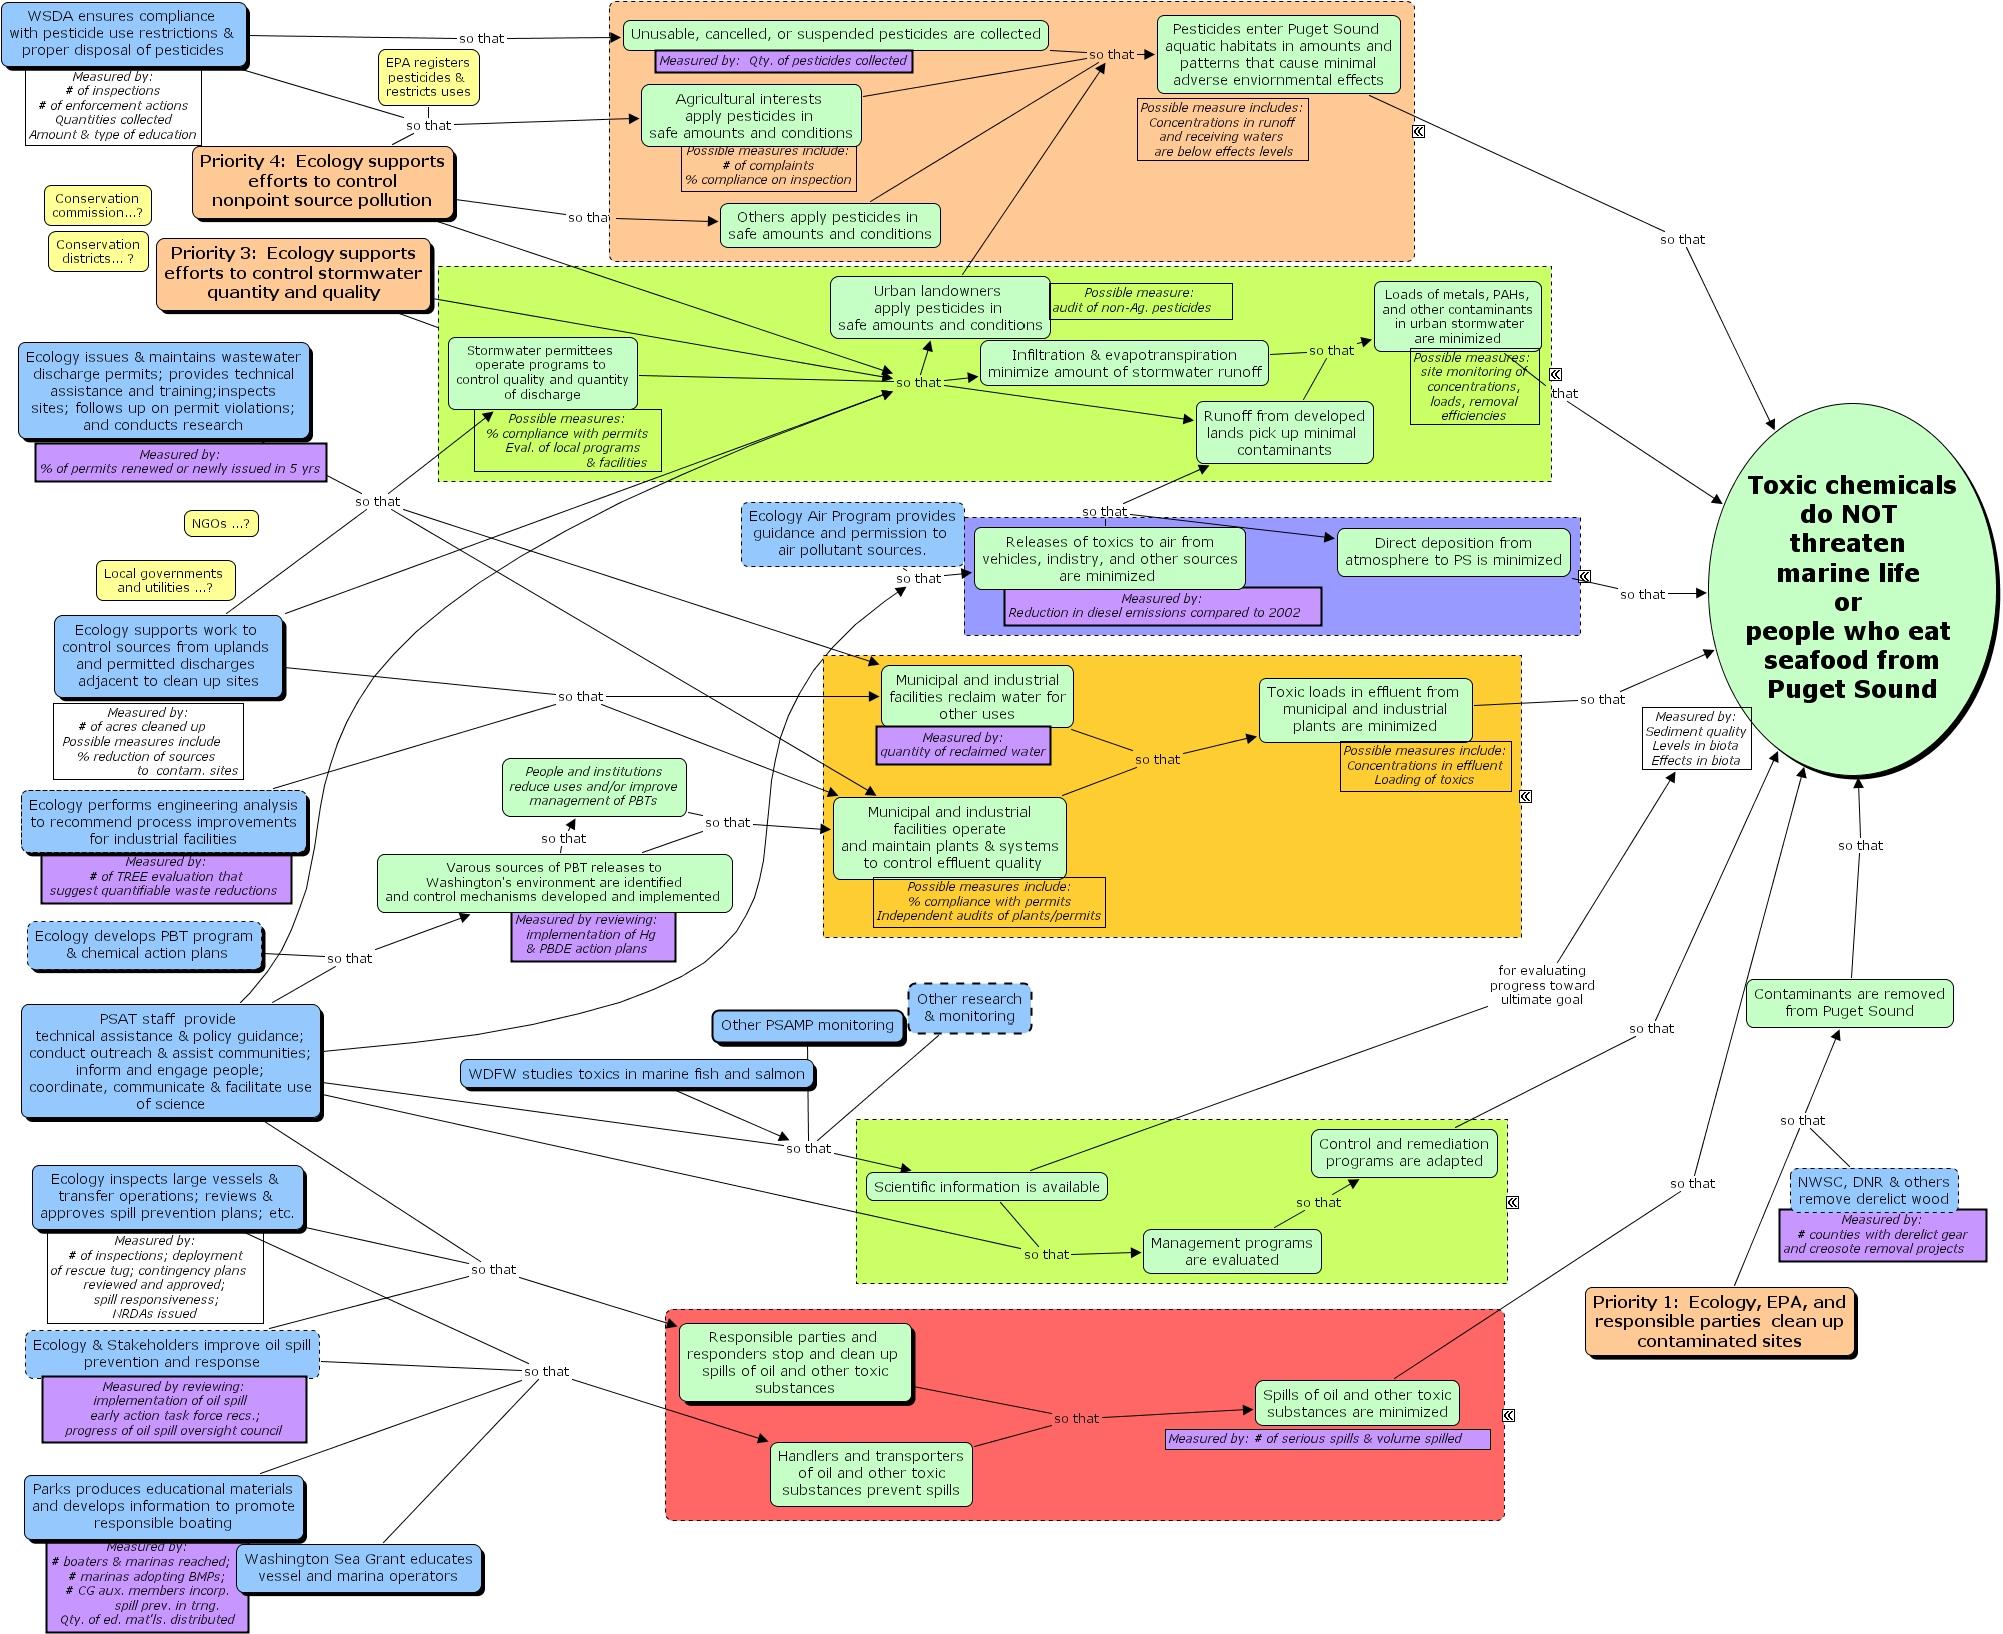 Ihmc Cmaptools Concept Map So That Toxics Do Not Threaten Puget